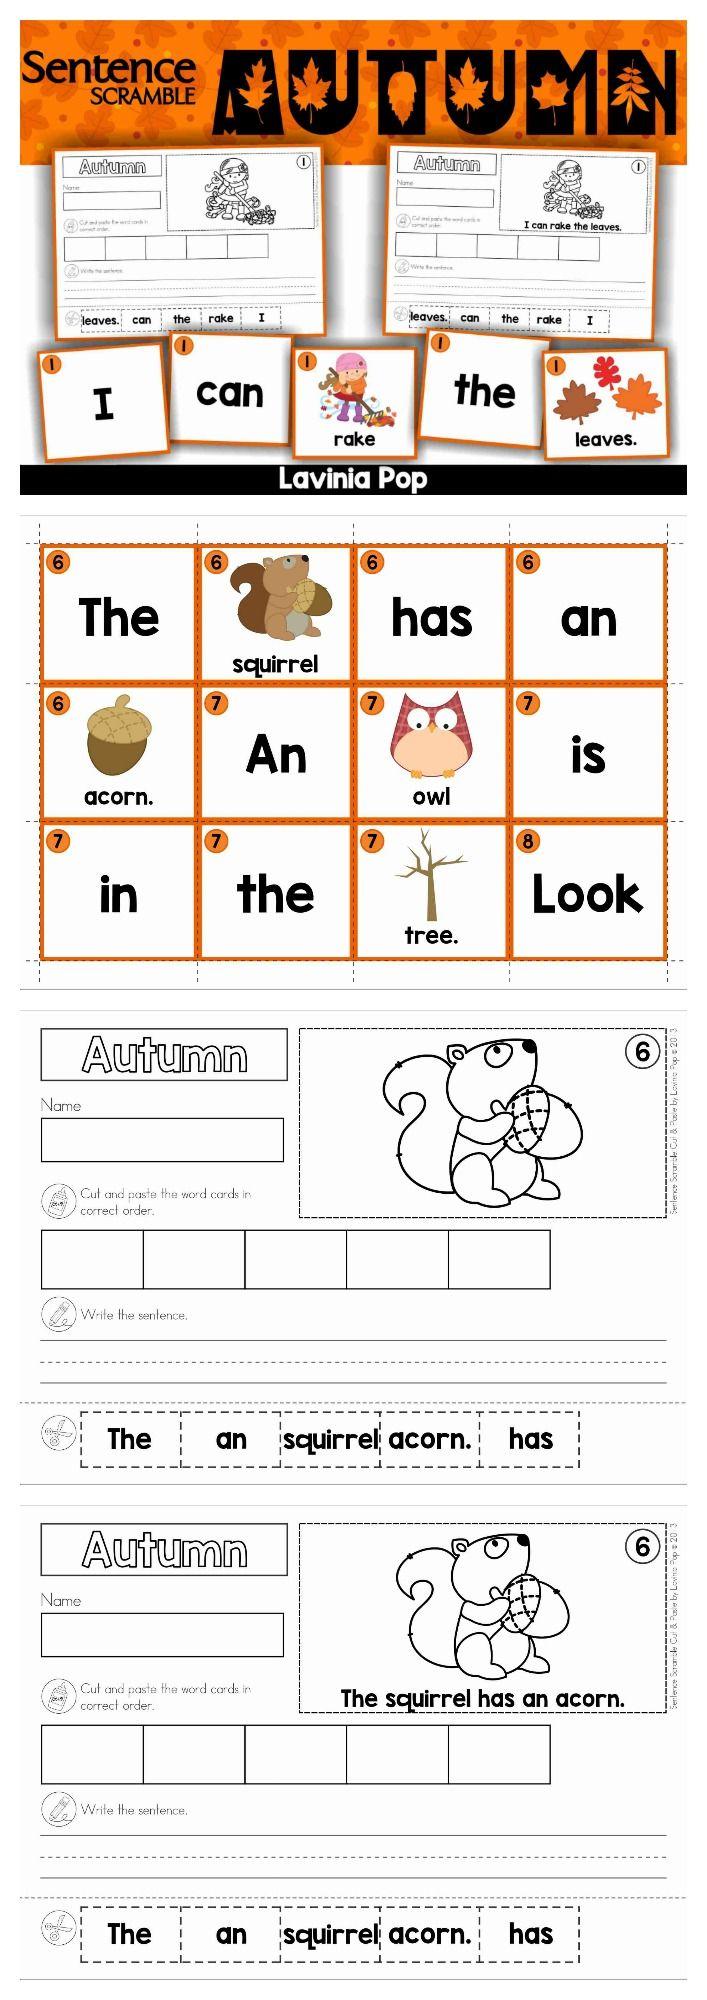 worksheet Sentence Scramble Worksheets autumn fall sentence scramble with cut and paste worksheets worksheets